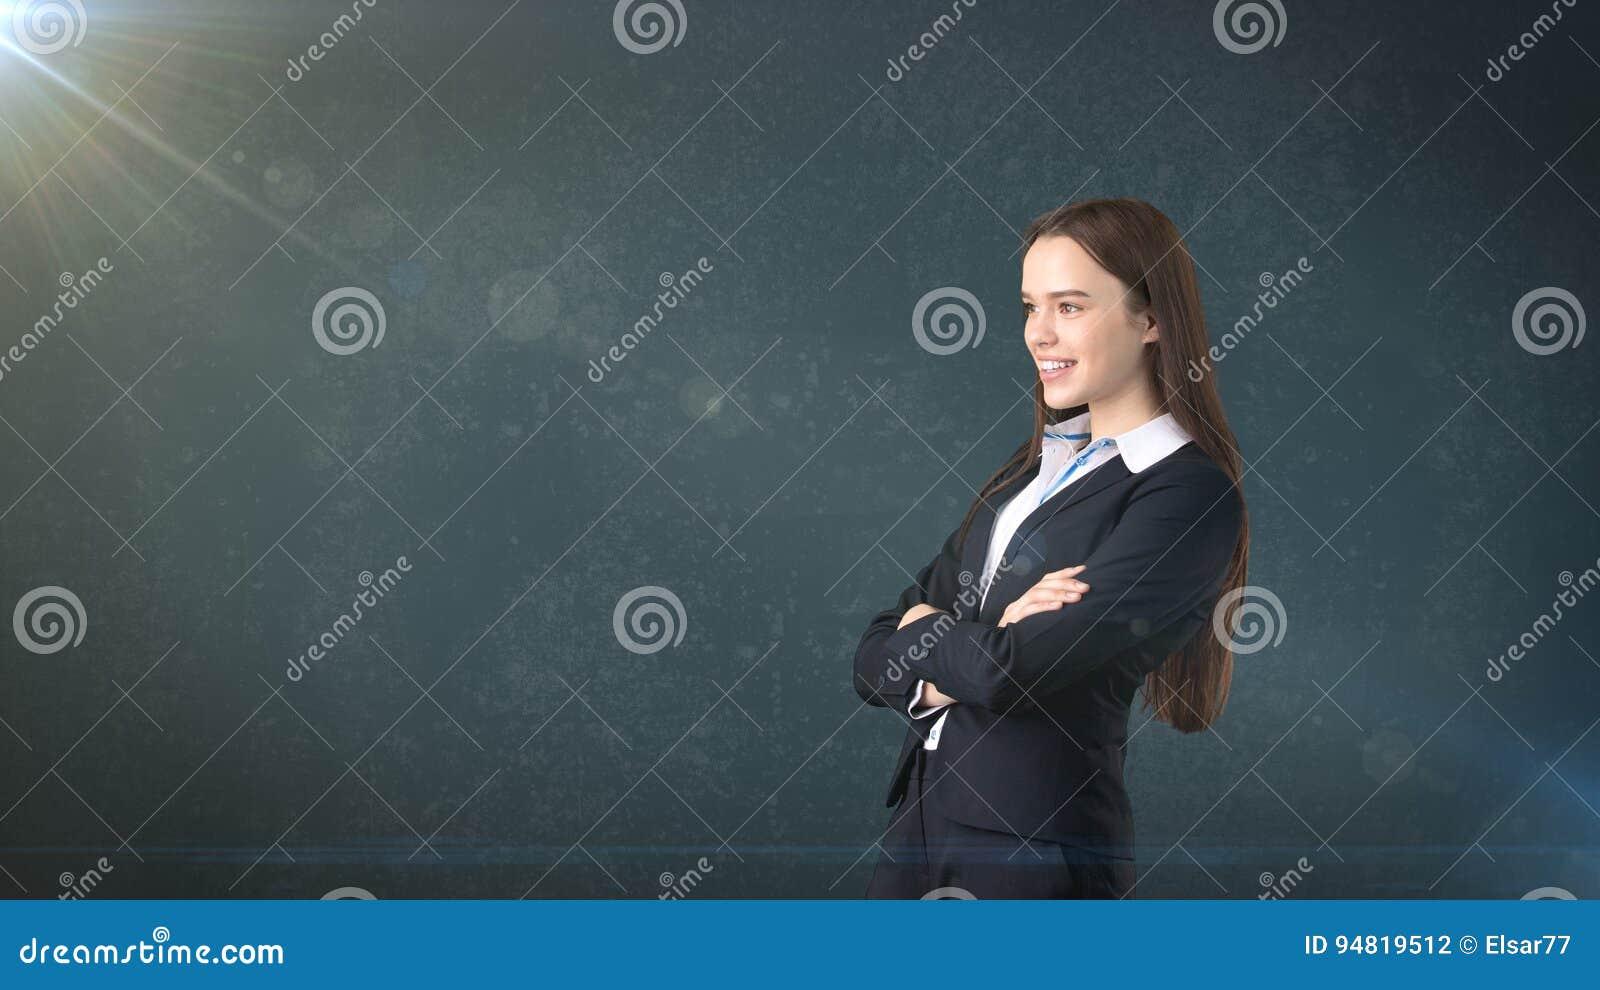 Young succesful beautiful businesswoman portrait in suit